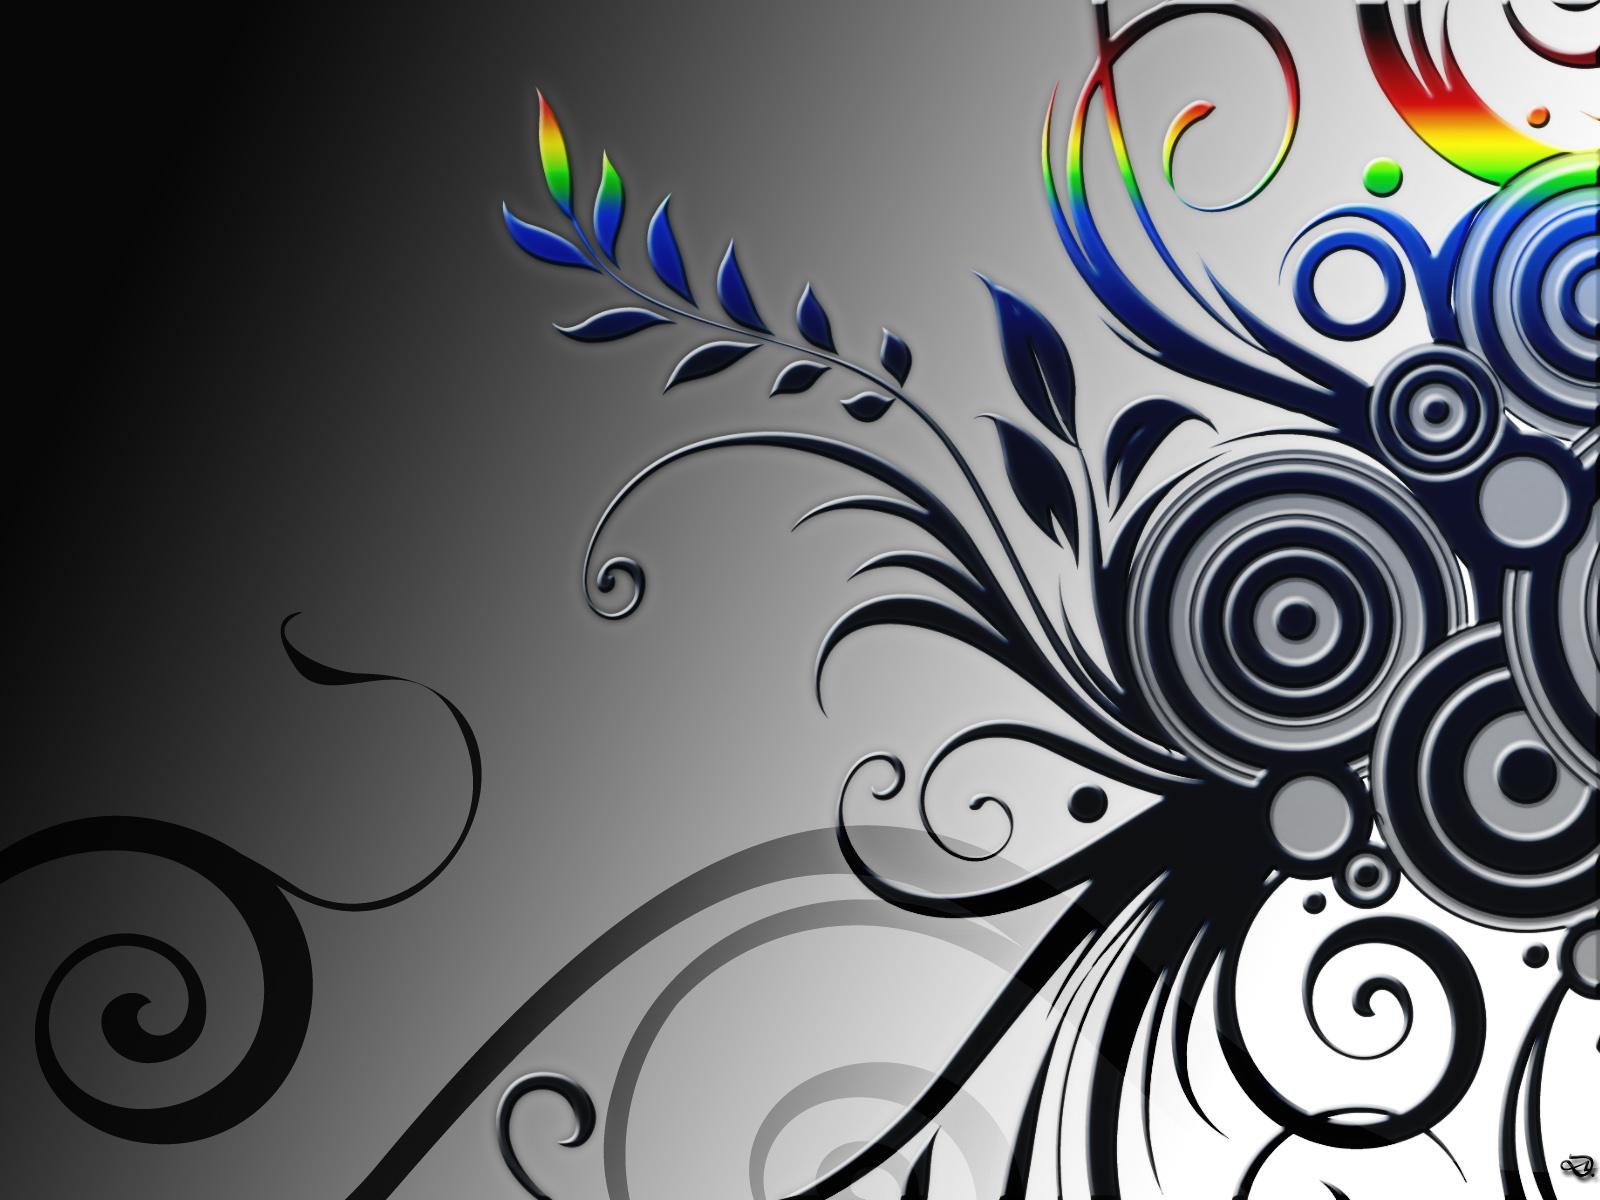 Black and White Vines desktop wallpaper 1600x1200